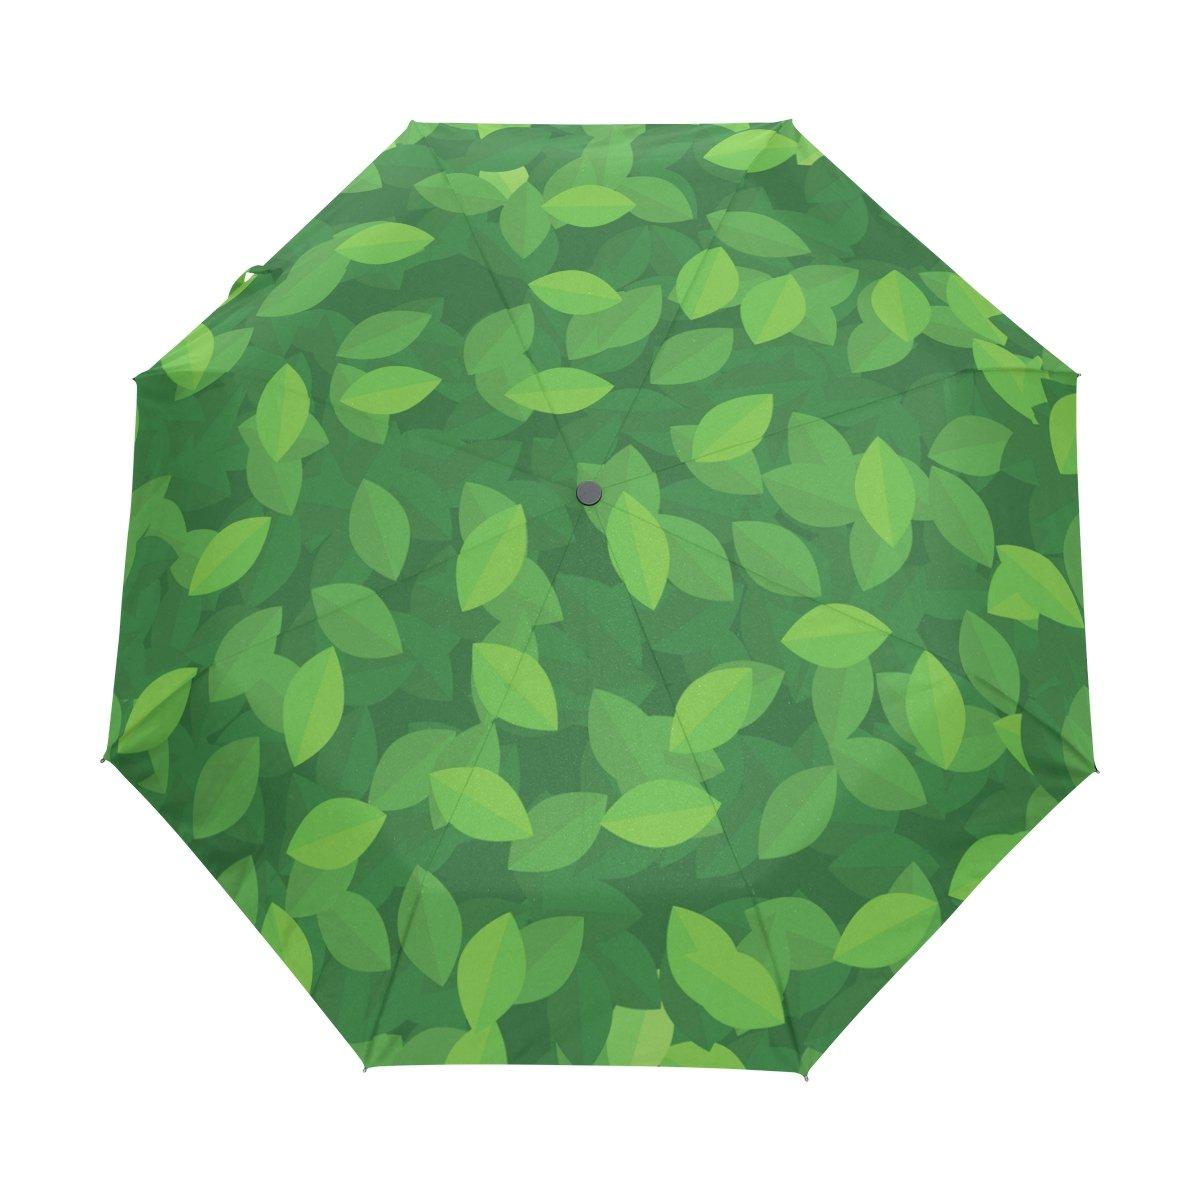 JSTeL Green Leaves防風UV傘Auto Open Close 3折りたたみゴルフStrong Durableコンパクト旅行太陽傘、ポータブル軽量簡単キャリー   B071JDRF93